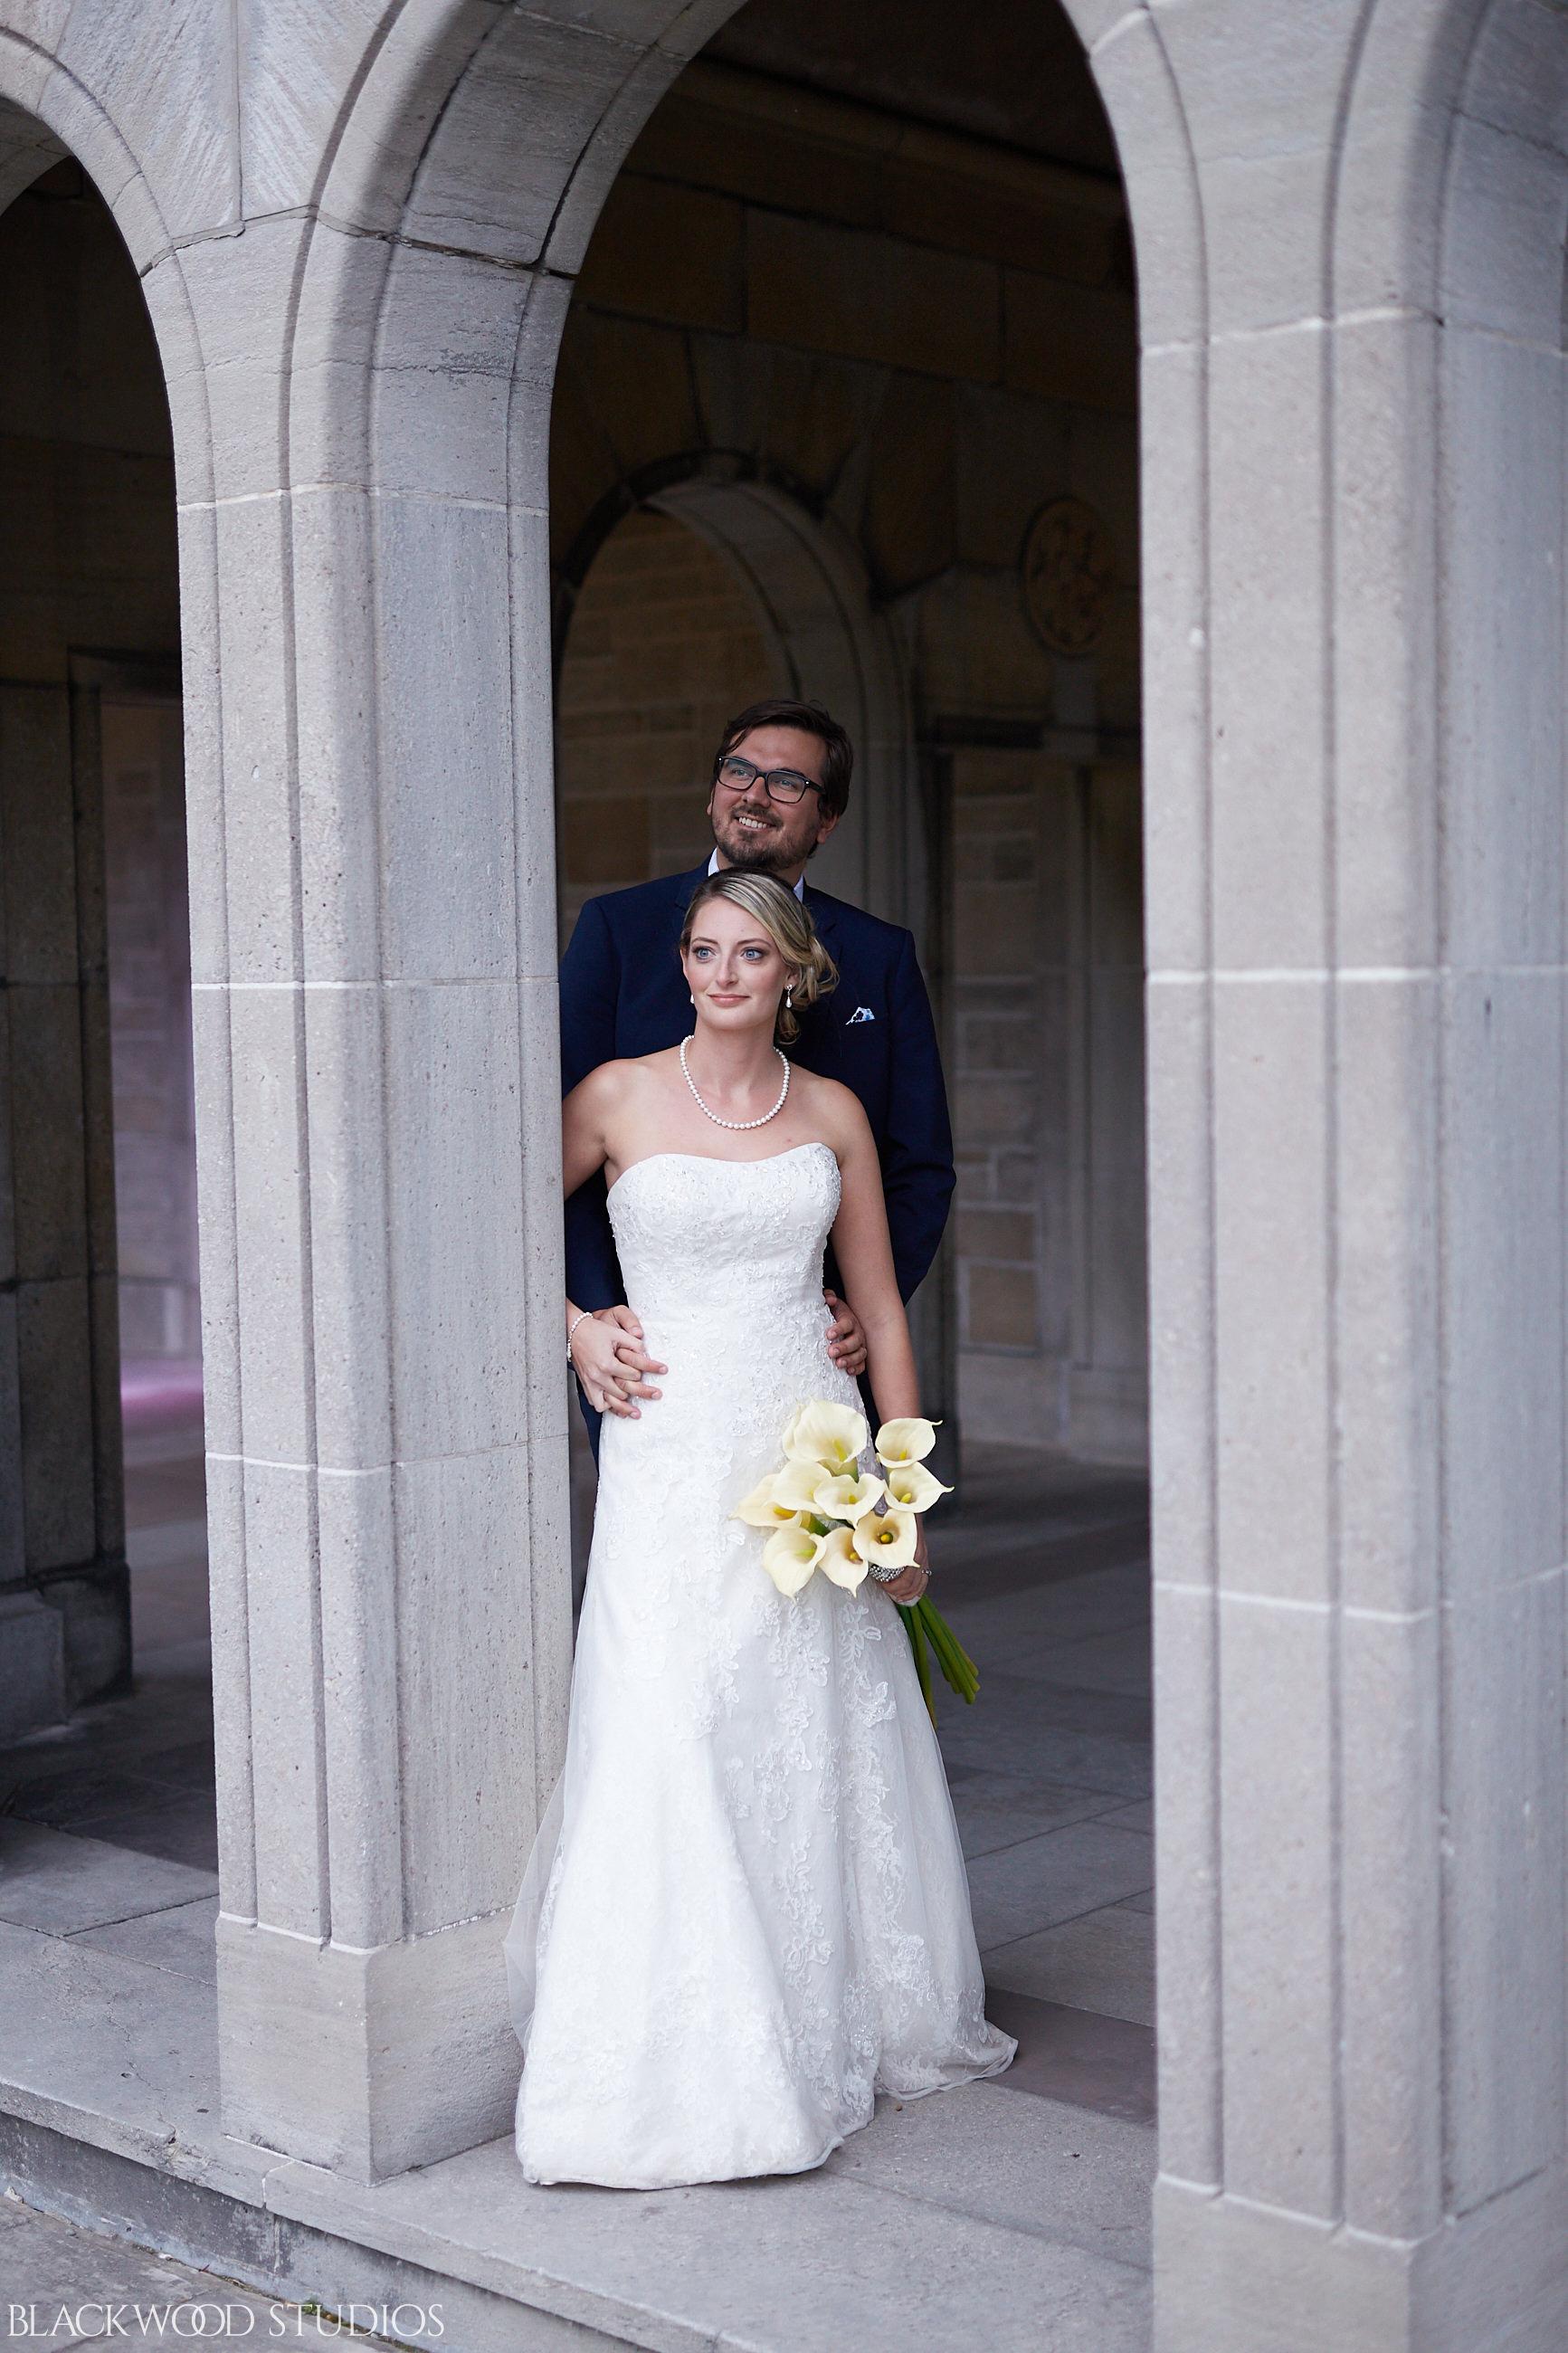 Blackwood-Studios-Wedding-Photography-20170928-184120-Marek-Katie-Michalek-Oakes-Garden-Theatre-Niagara-Falls-Ontario-Canada.jpg